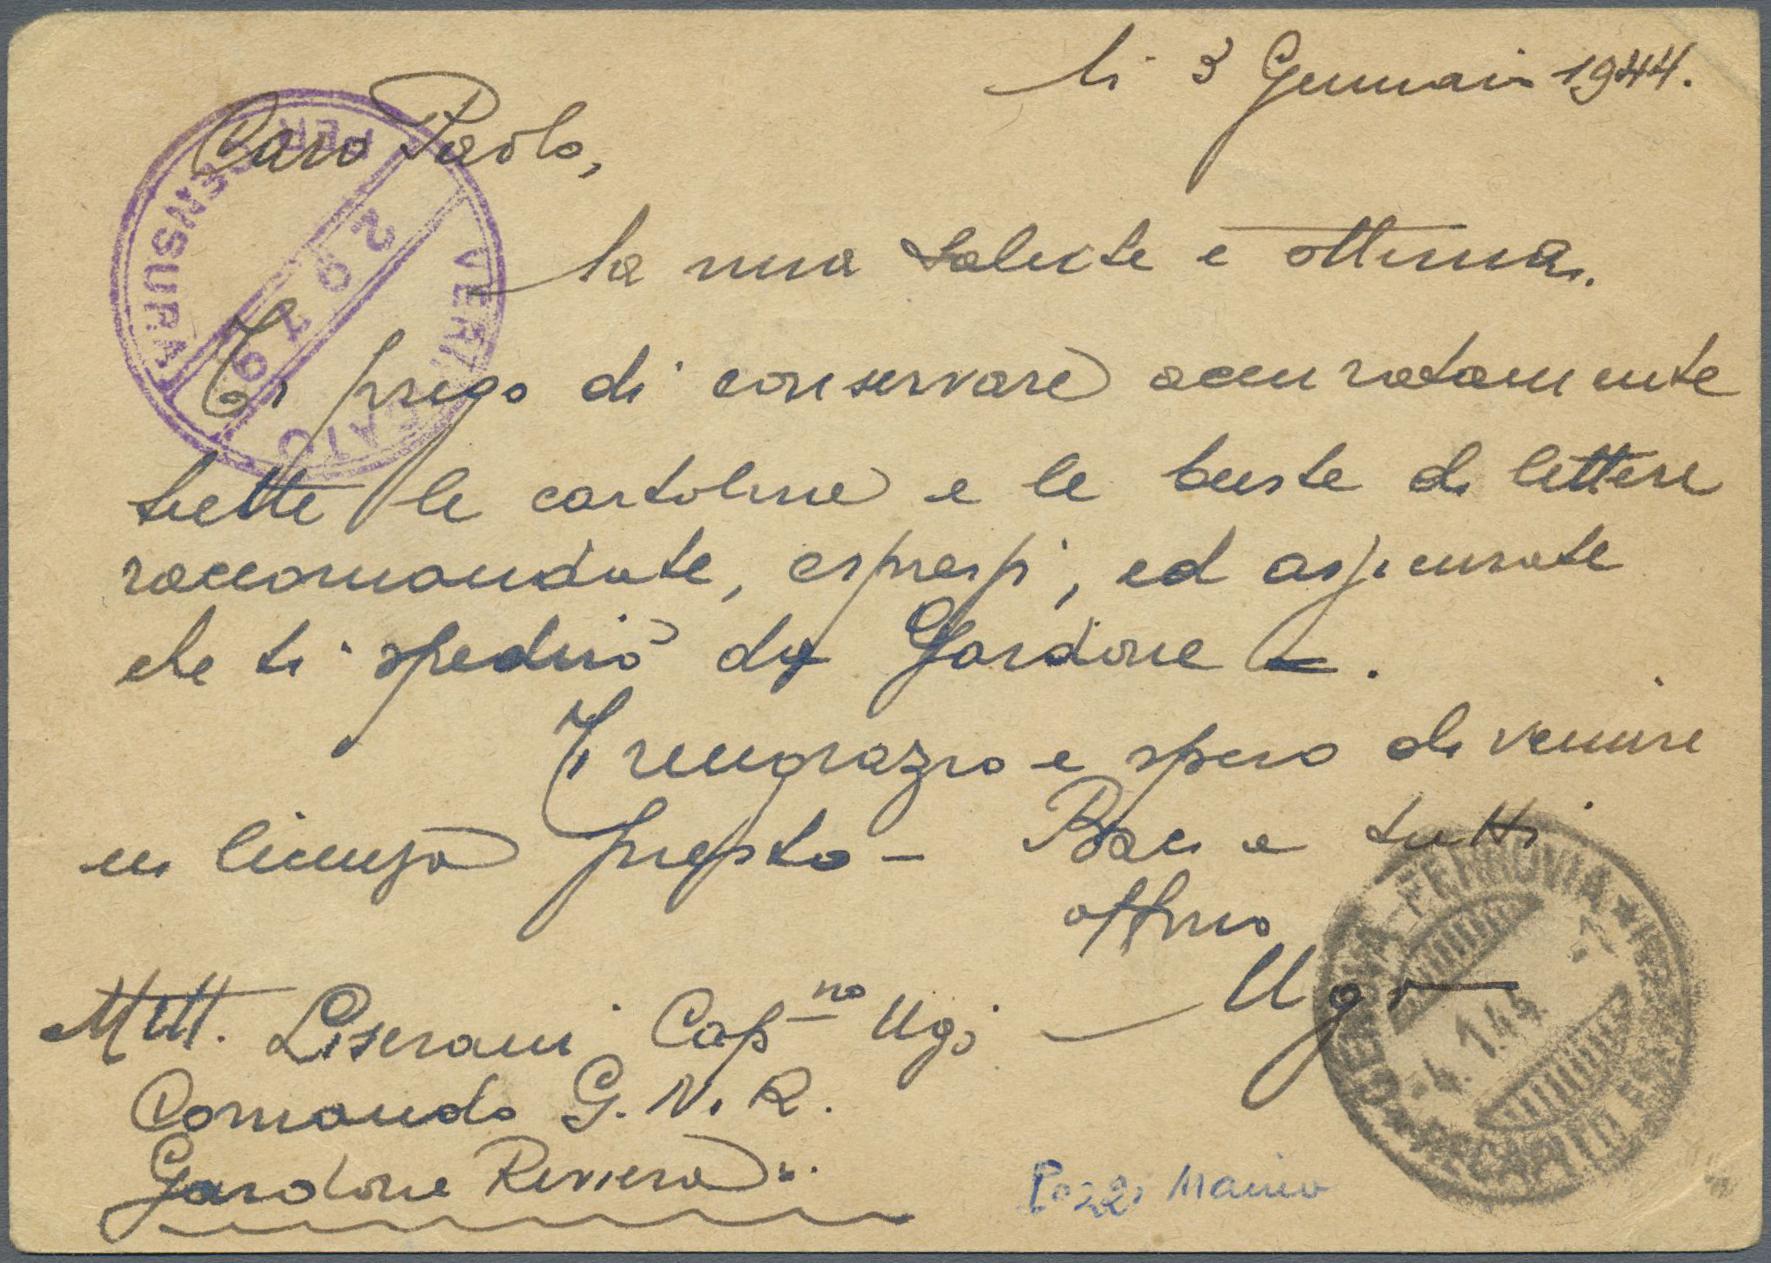 Lot 17092 - Italien - Militärpostmarken: Nationalgarde  -  Auktionshaus Christoph Gärtner GmbH & Co. KG Single lots Philately Overseas & Europe. Auction #39 Day 4